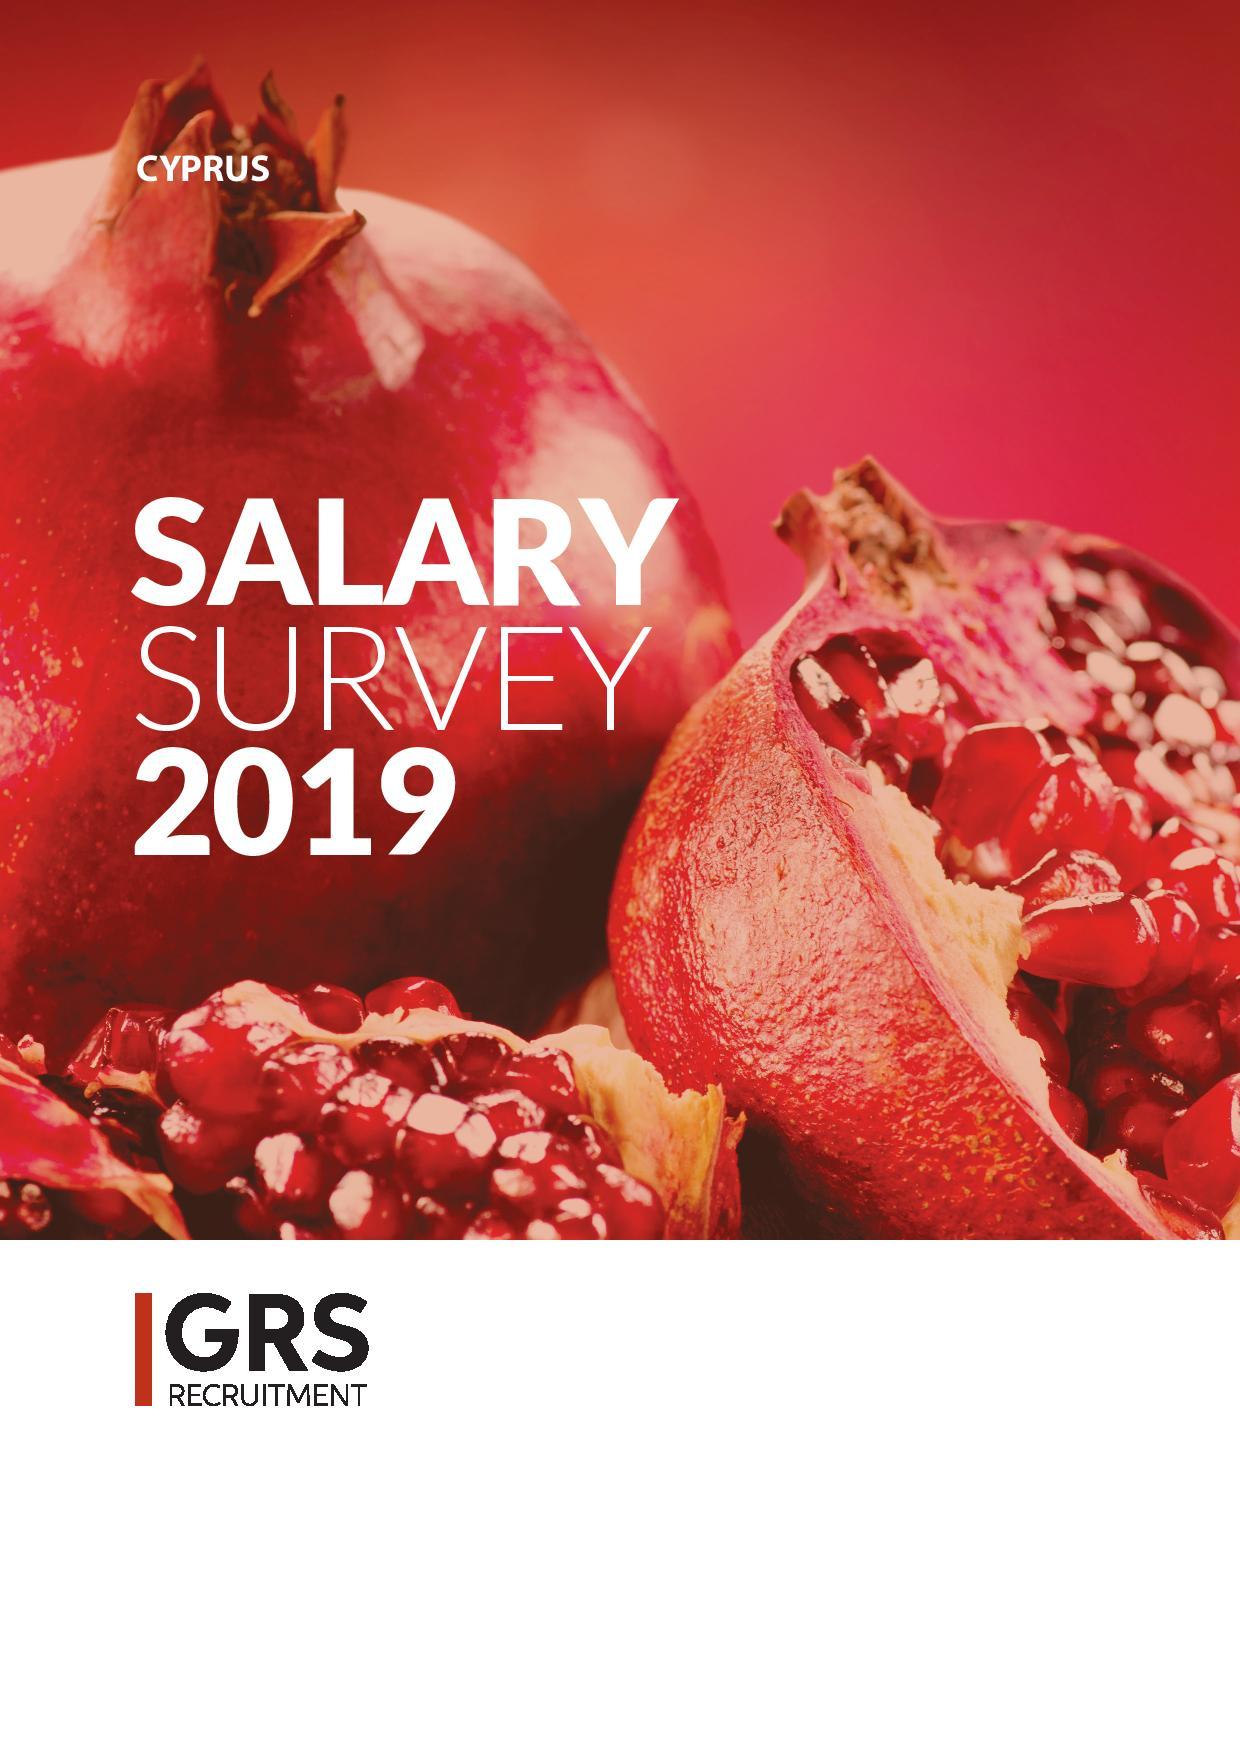 GRS: Salary Survey 2019